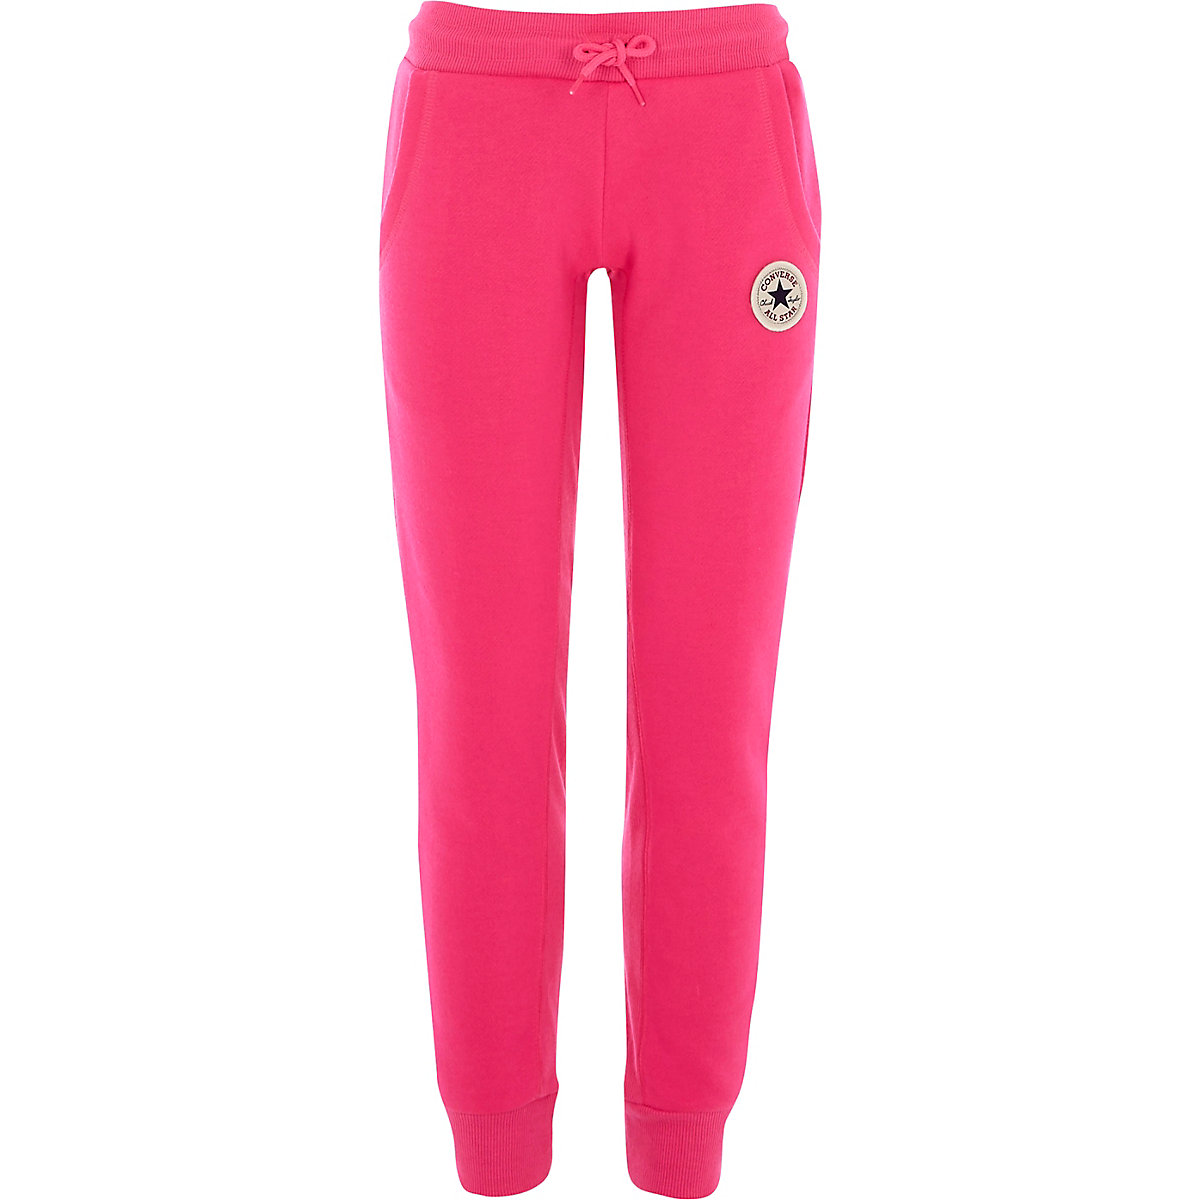 Girls Converse bright pink joggers